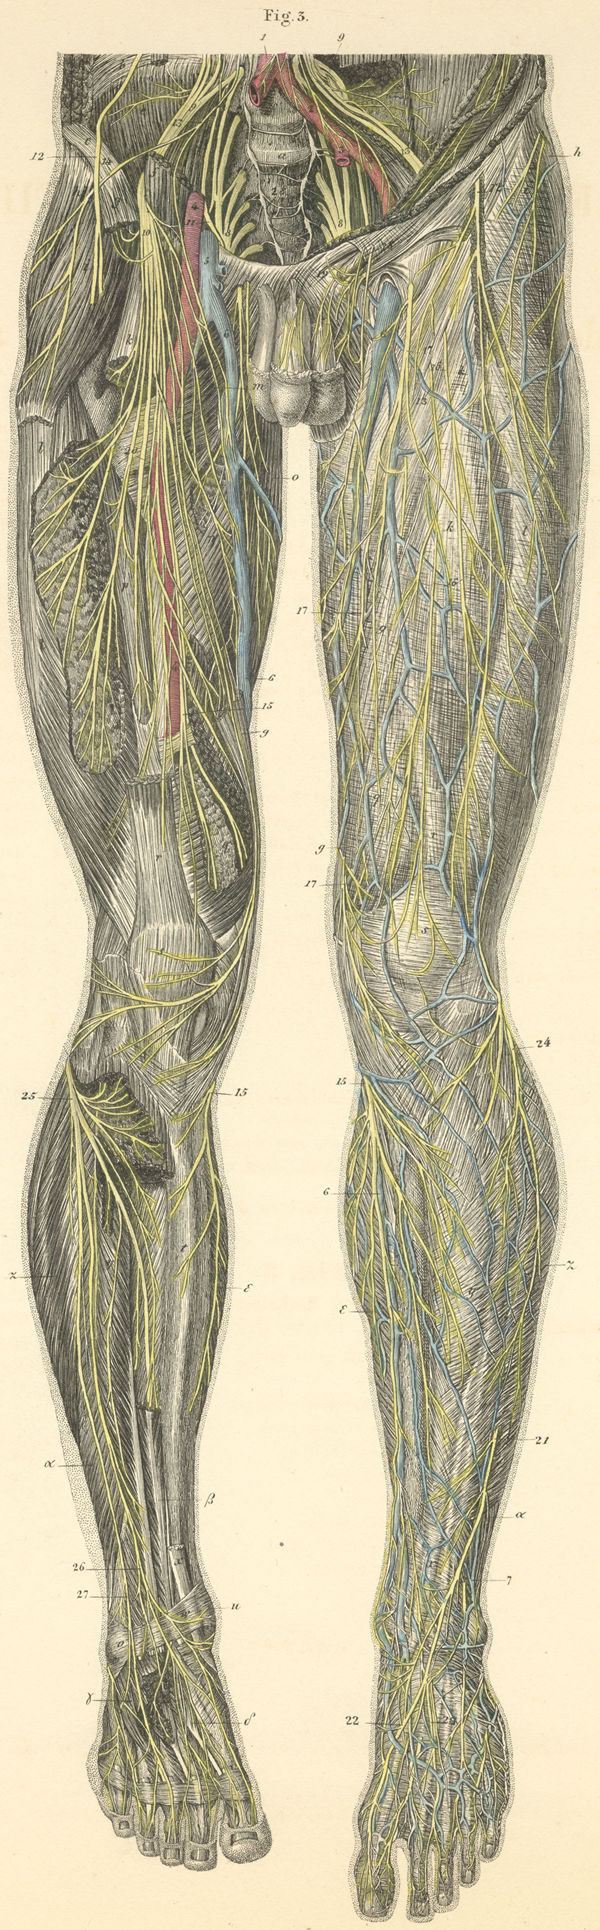 Anatomy Atlases Atlas Of Human Anatomy Plate 28 Figure 3